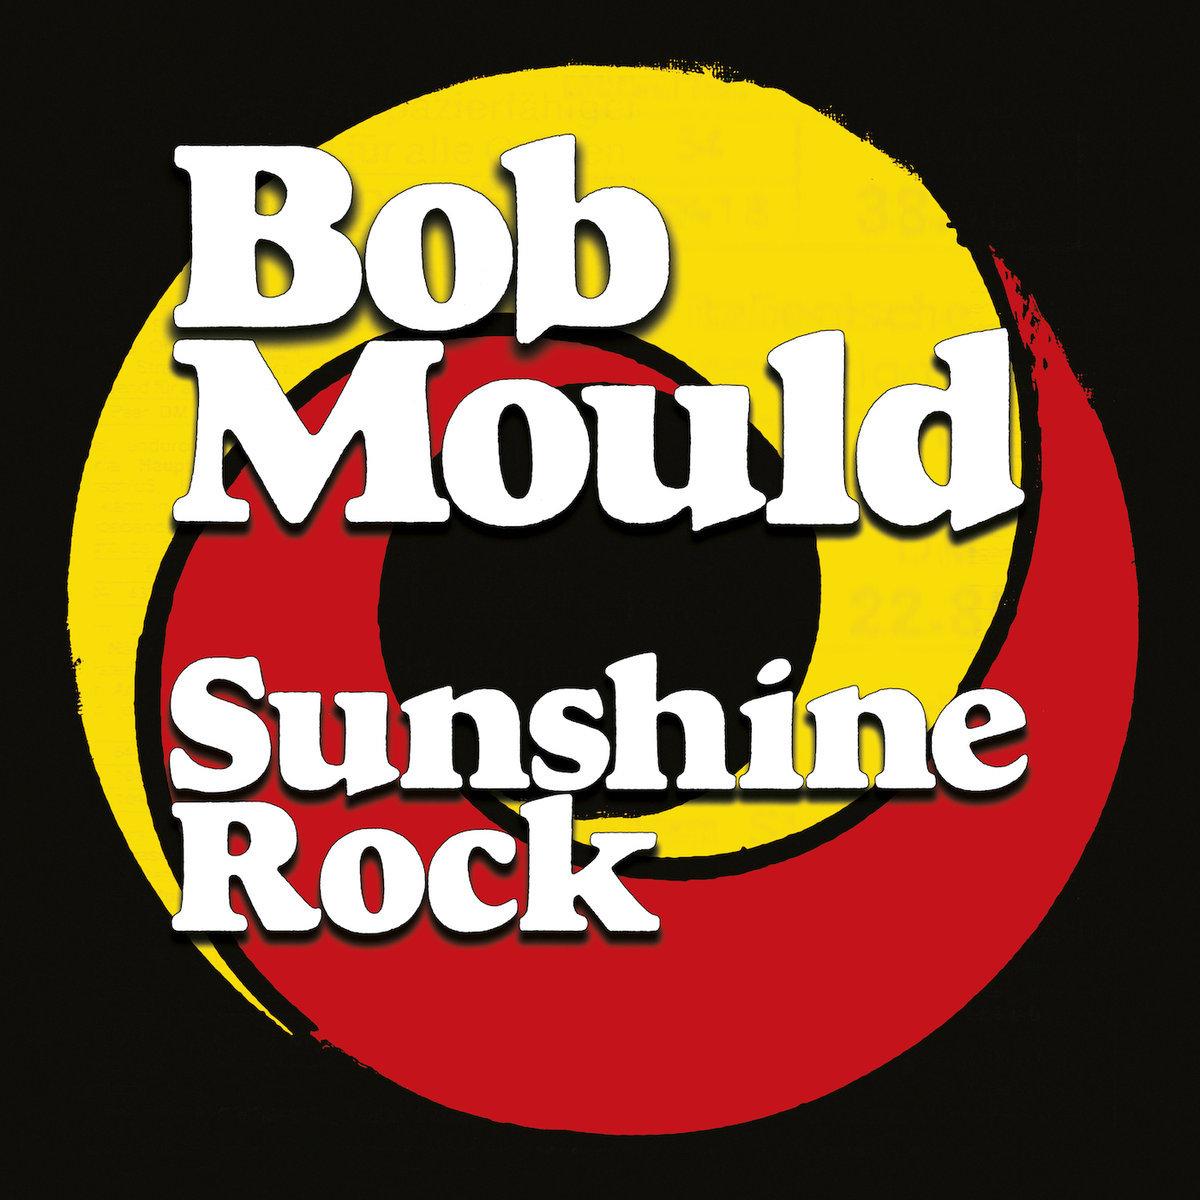 sunshine rock bob mould Bob Mould announces new album, Sunshine Rock, shares title track: Stream